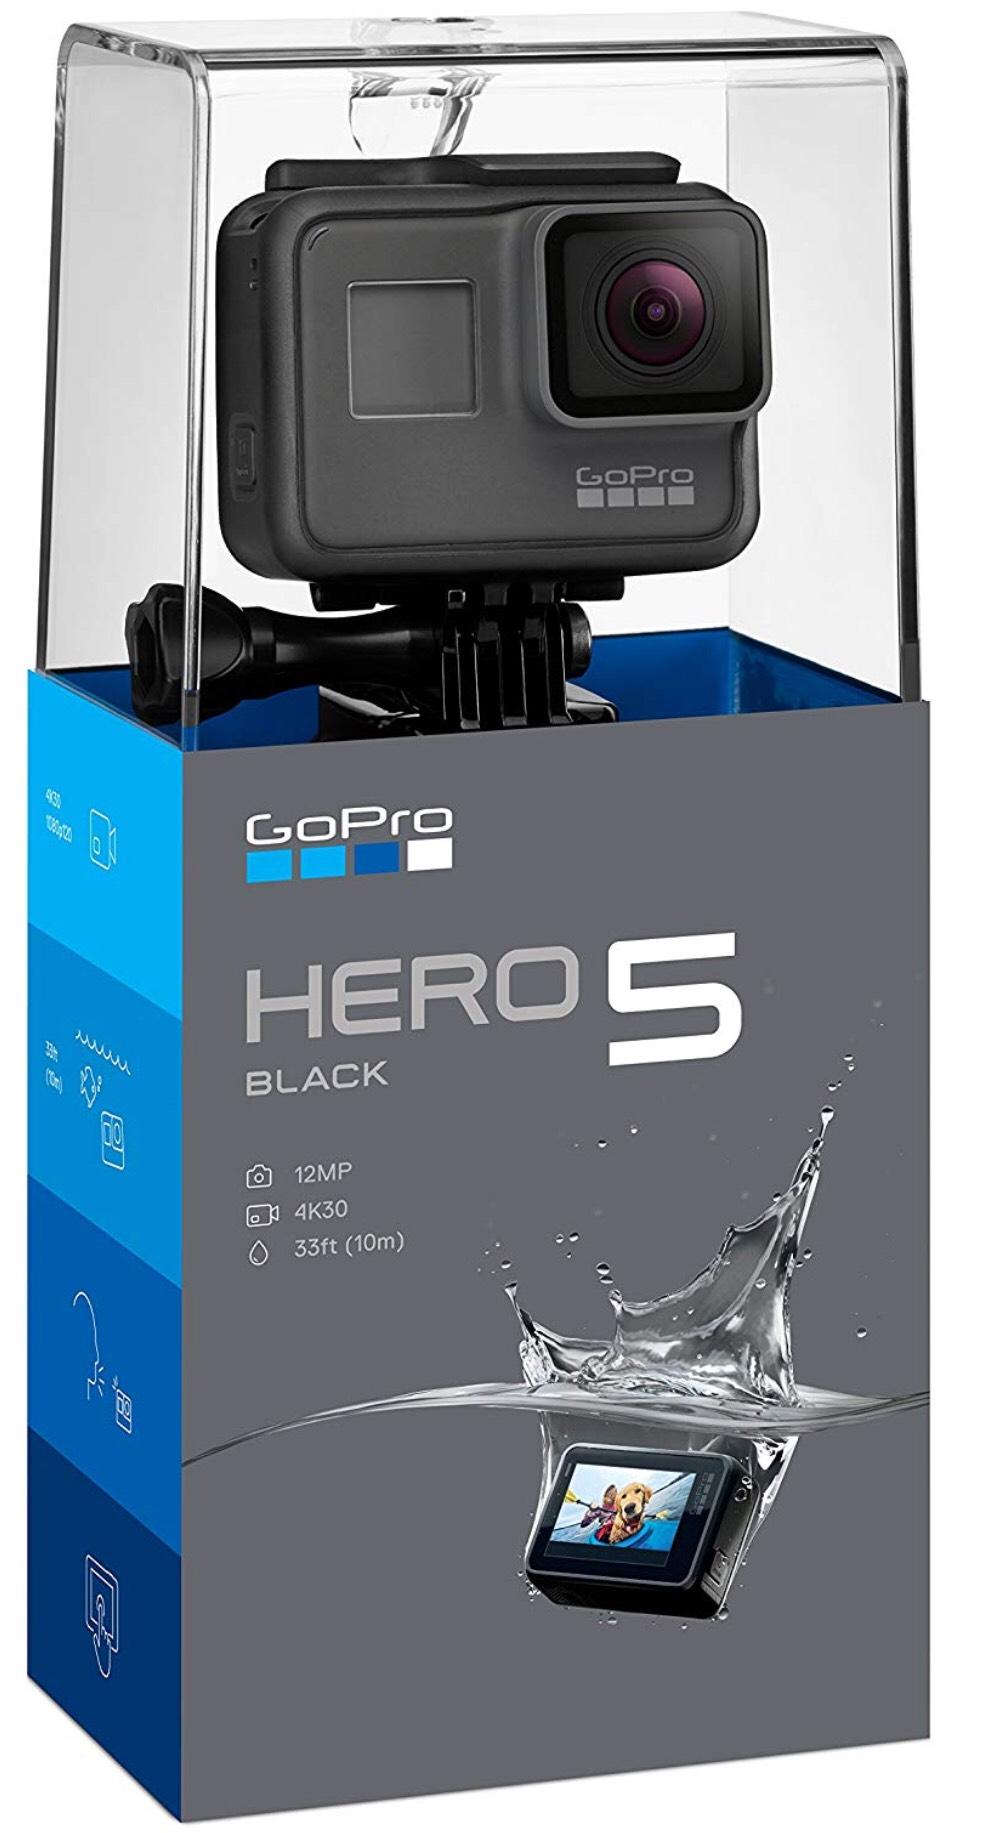 GoPro Hero 5 Black Action Camera - £269.99 Delivered @ Amazon